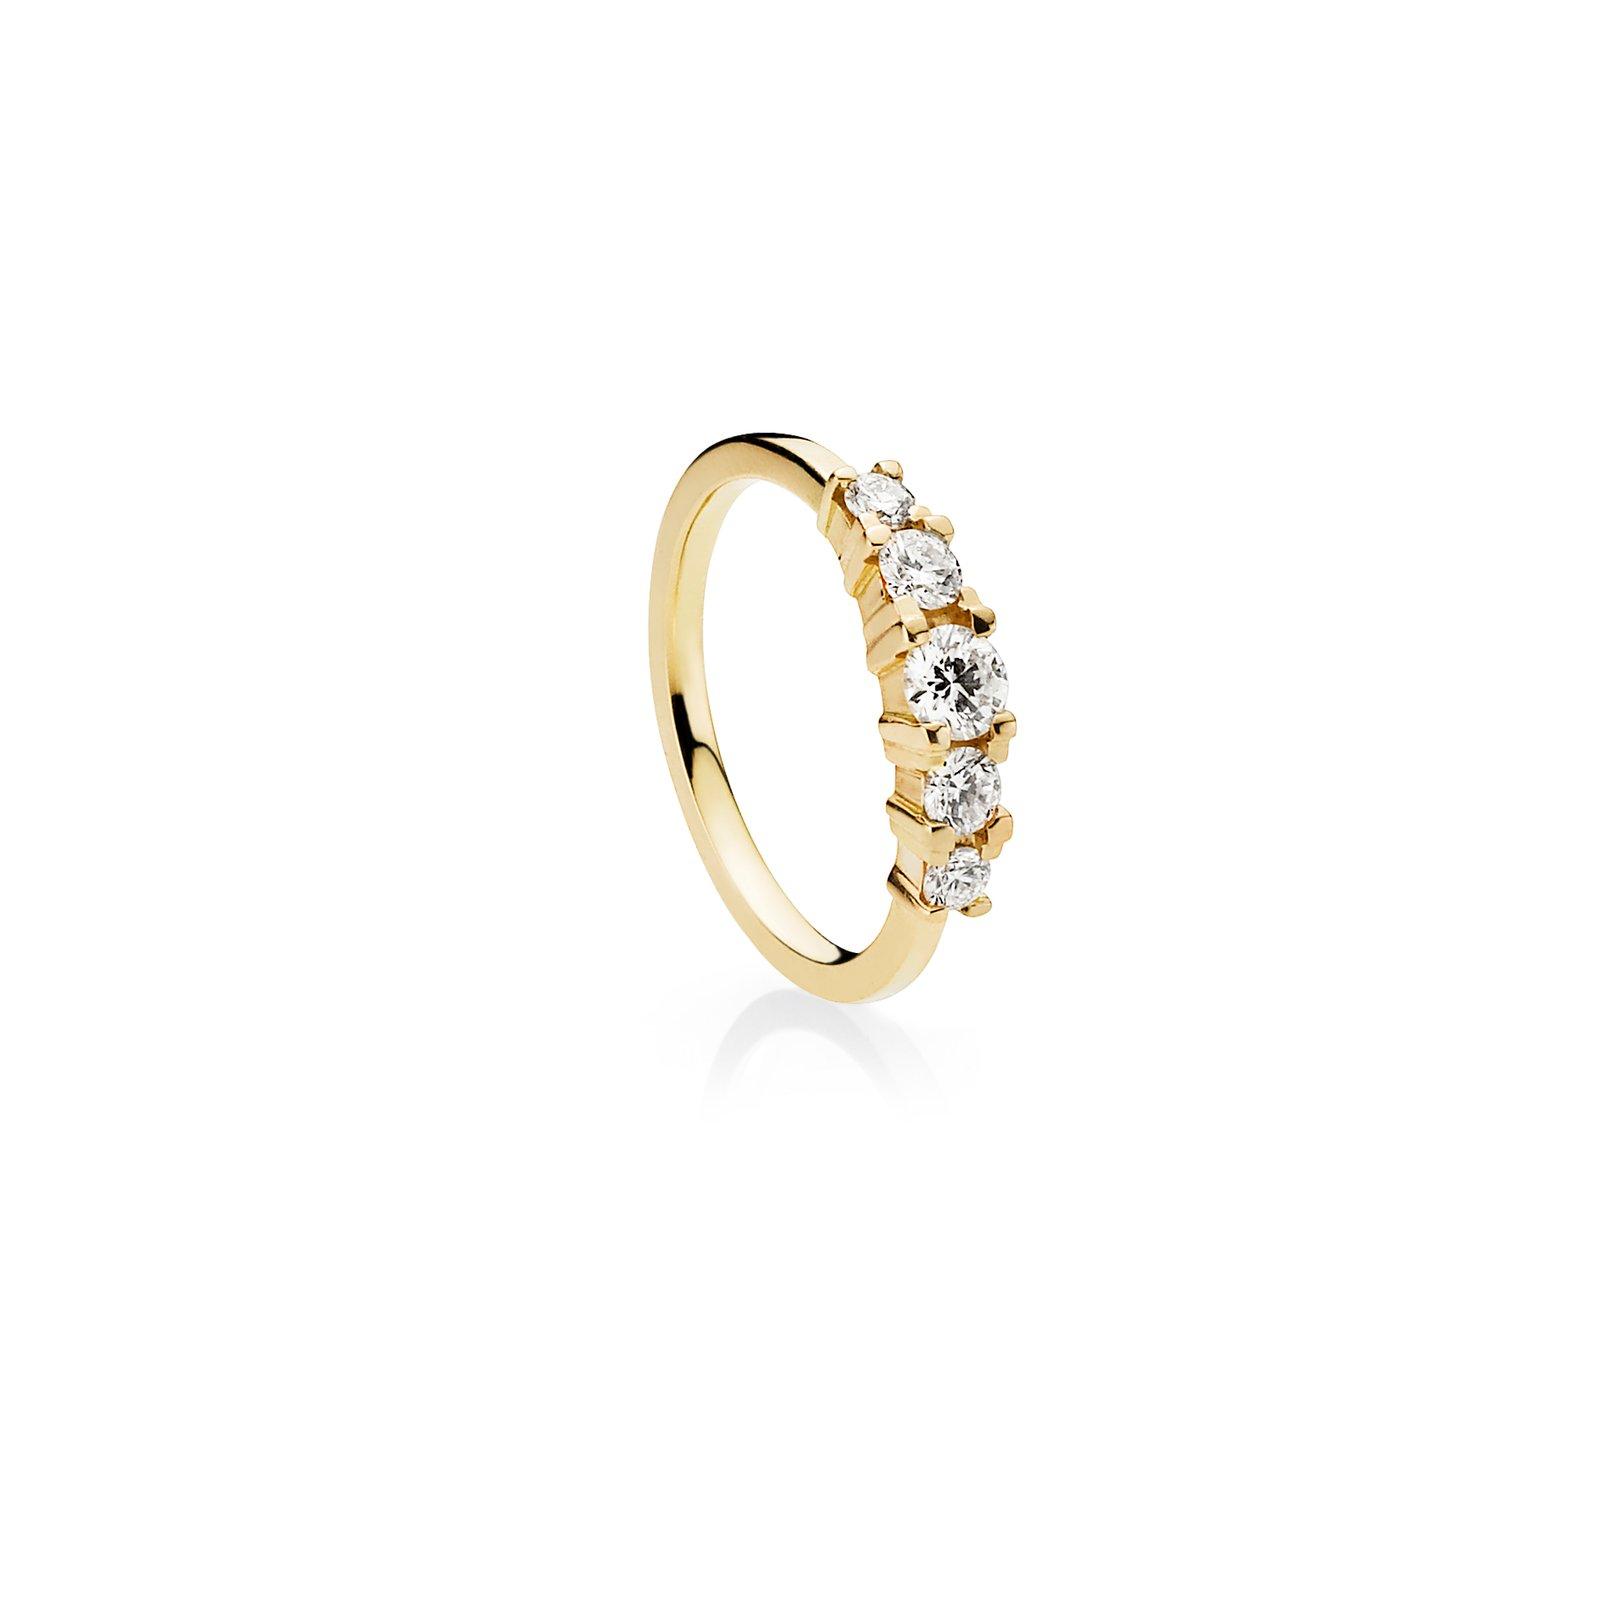 Five Star Diamond Ring, Gold / cortkoppel